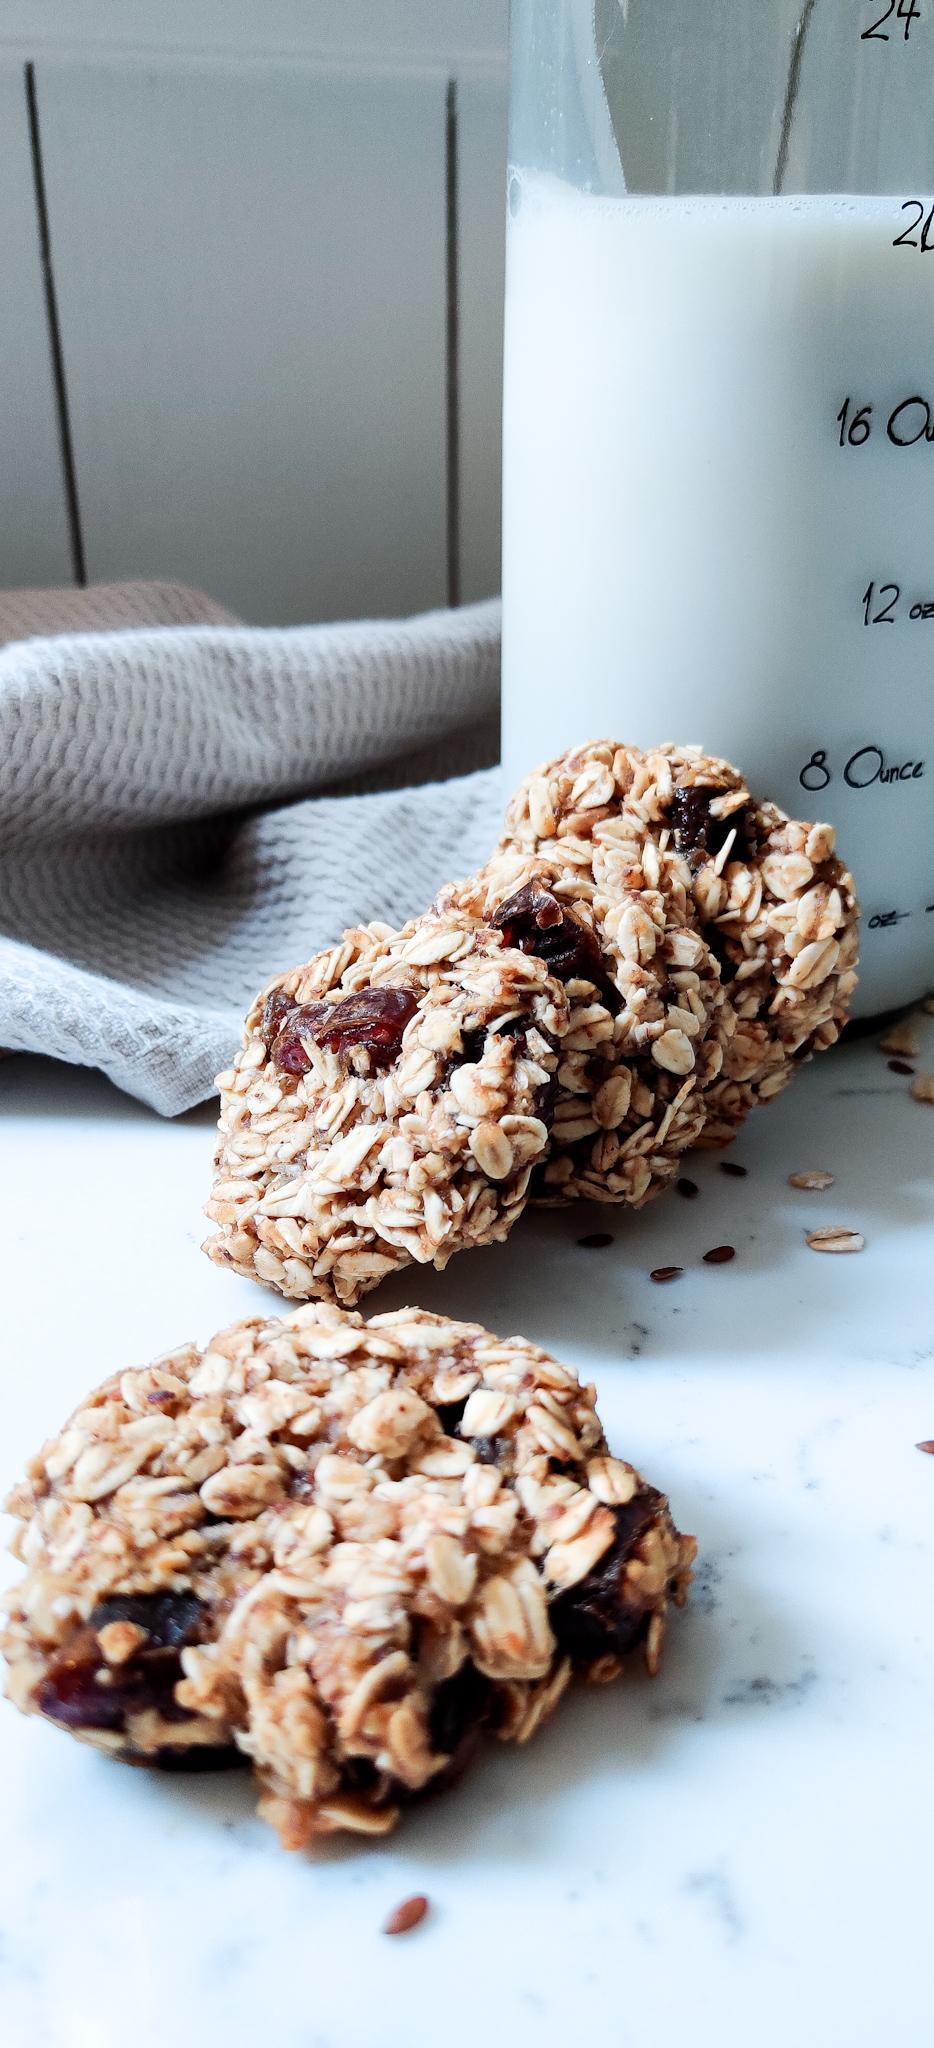 Oatmeal and Date Breakfast Cookies